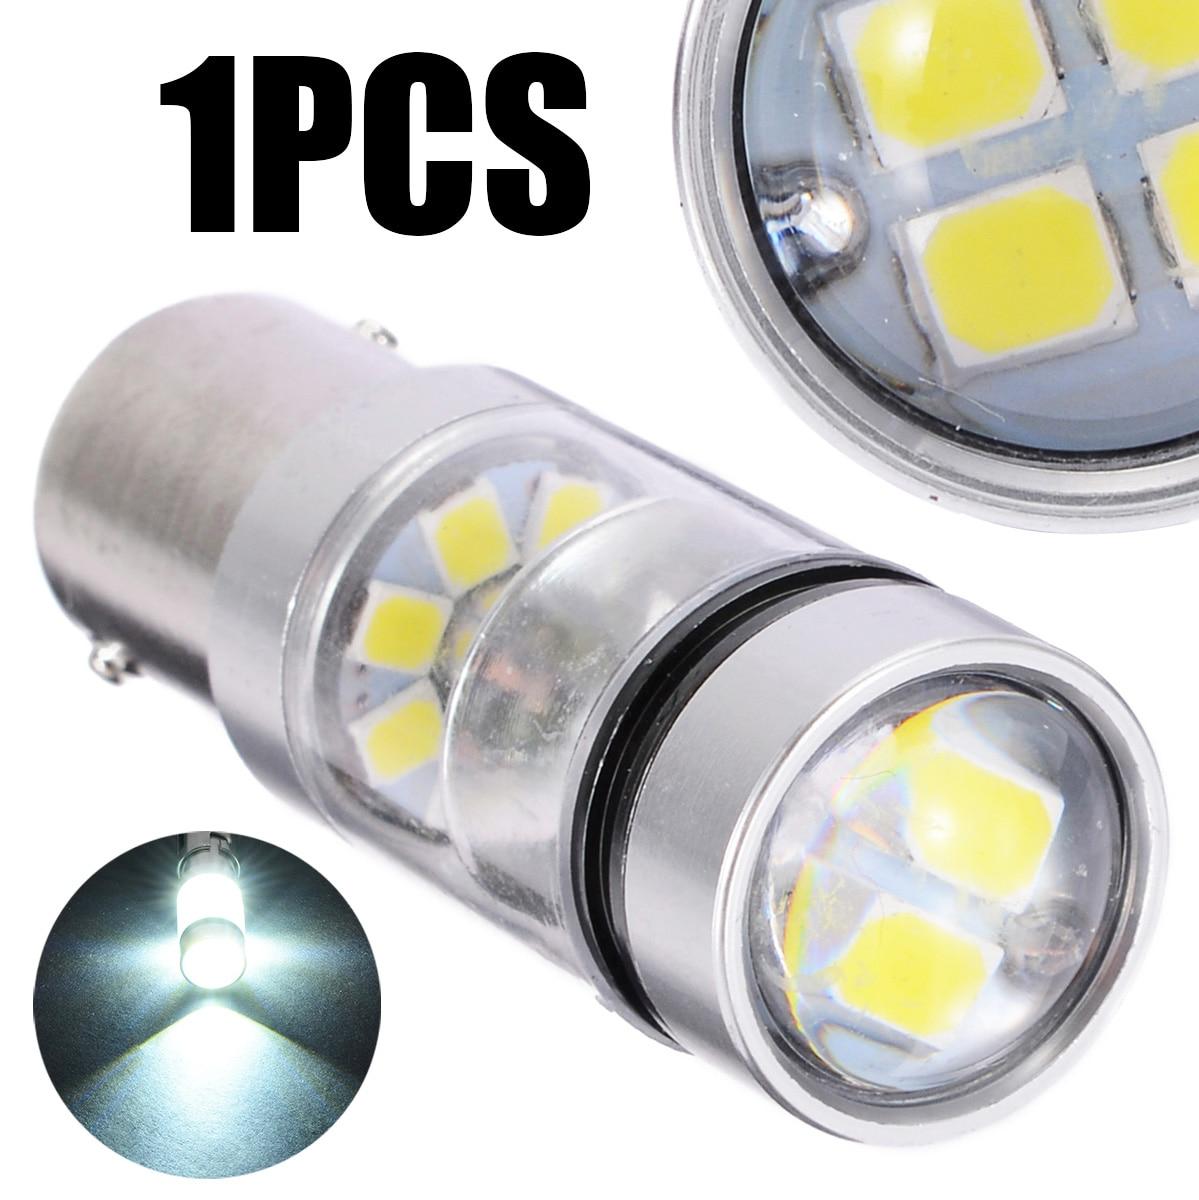 1pc 100W 1156 S25 P21W BA15S LED 헤드 라이트 백업 램프 전구 화이트 360